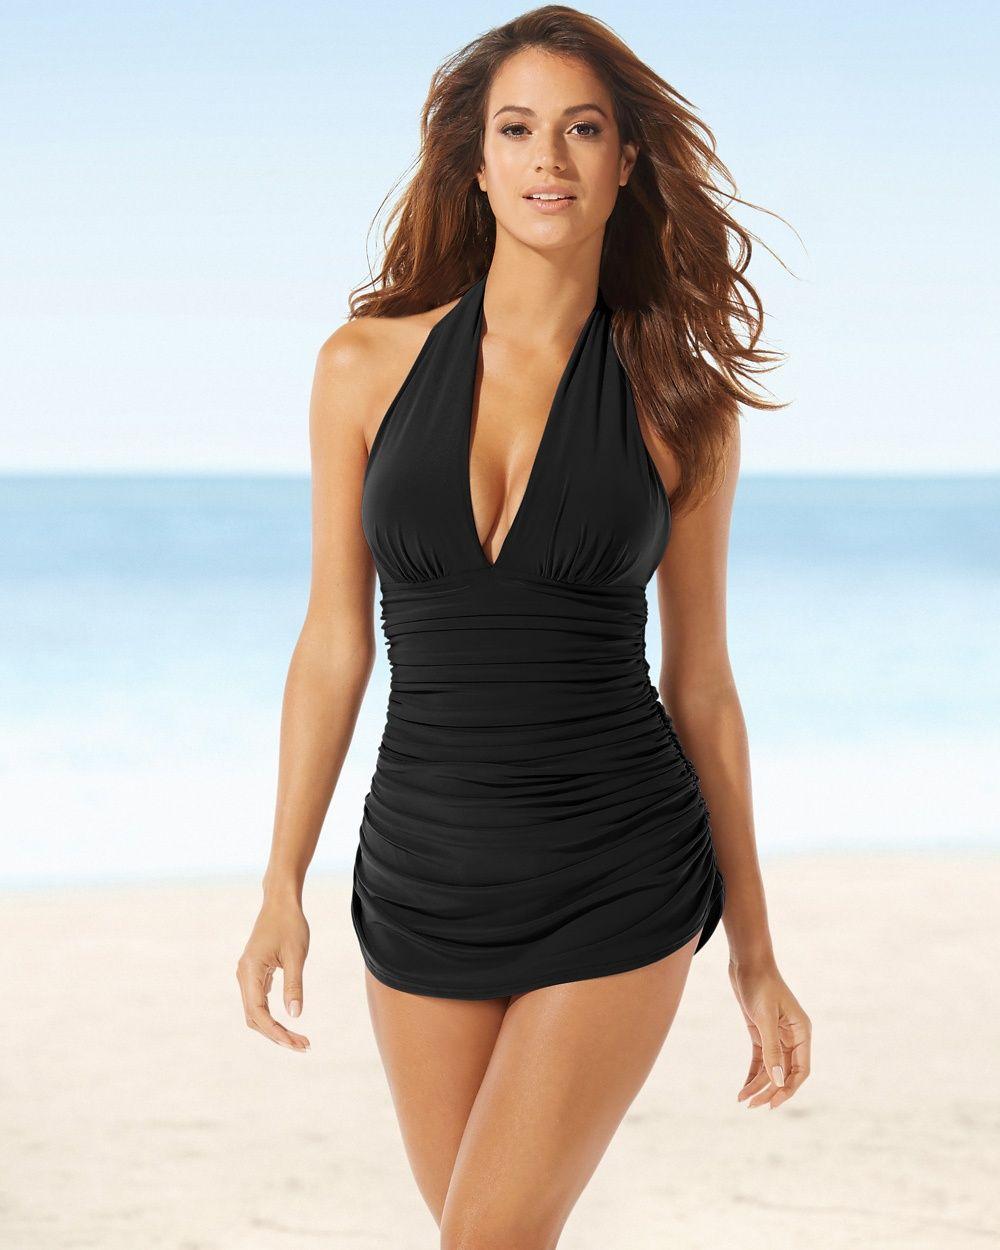 e6d2250b78125 Shop Tummy Minimizer Swimwear - Free Shipping - Soma